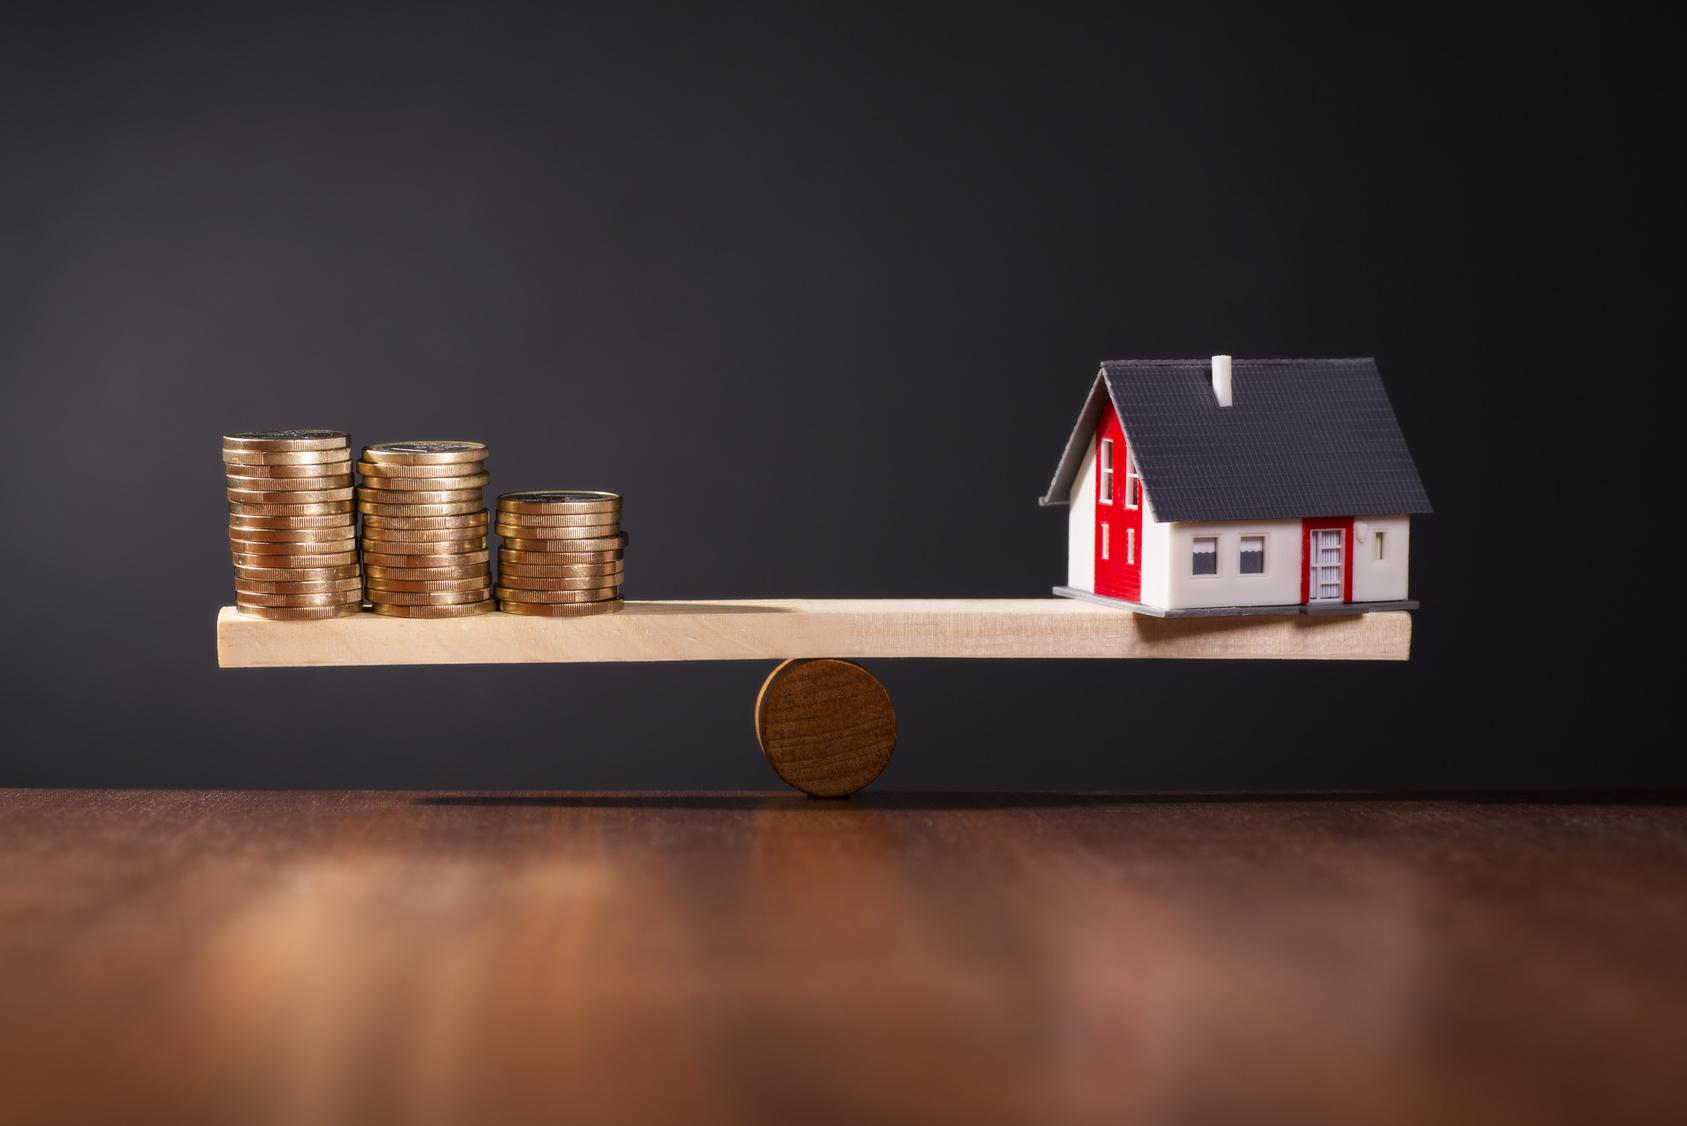 beleihungswert beleihungswertermittlung obergrenze der beleihung ermitteln haus immobilie. Black Bedroom Furniture Sets. Home Design Ideas